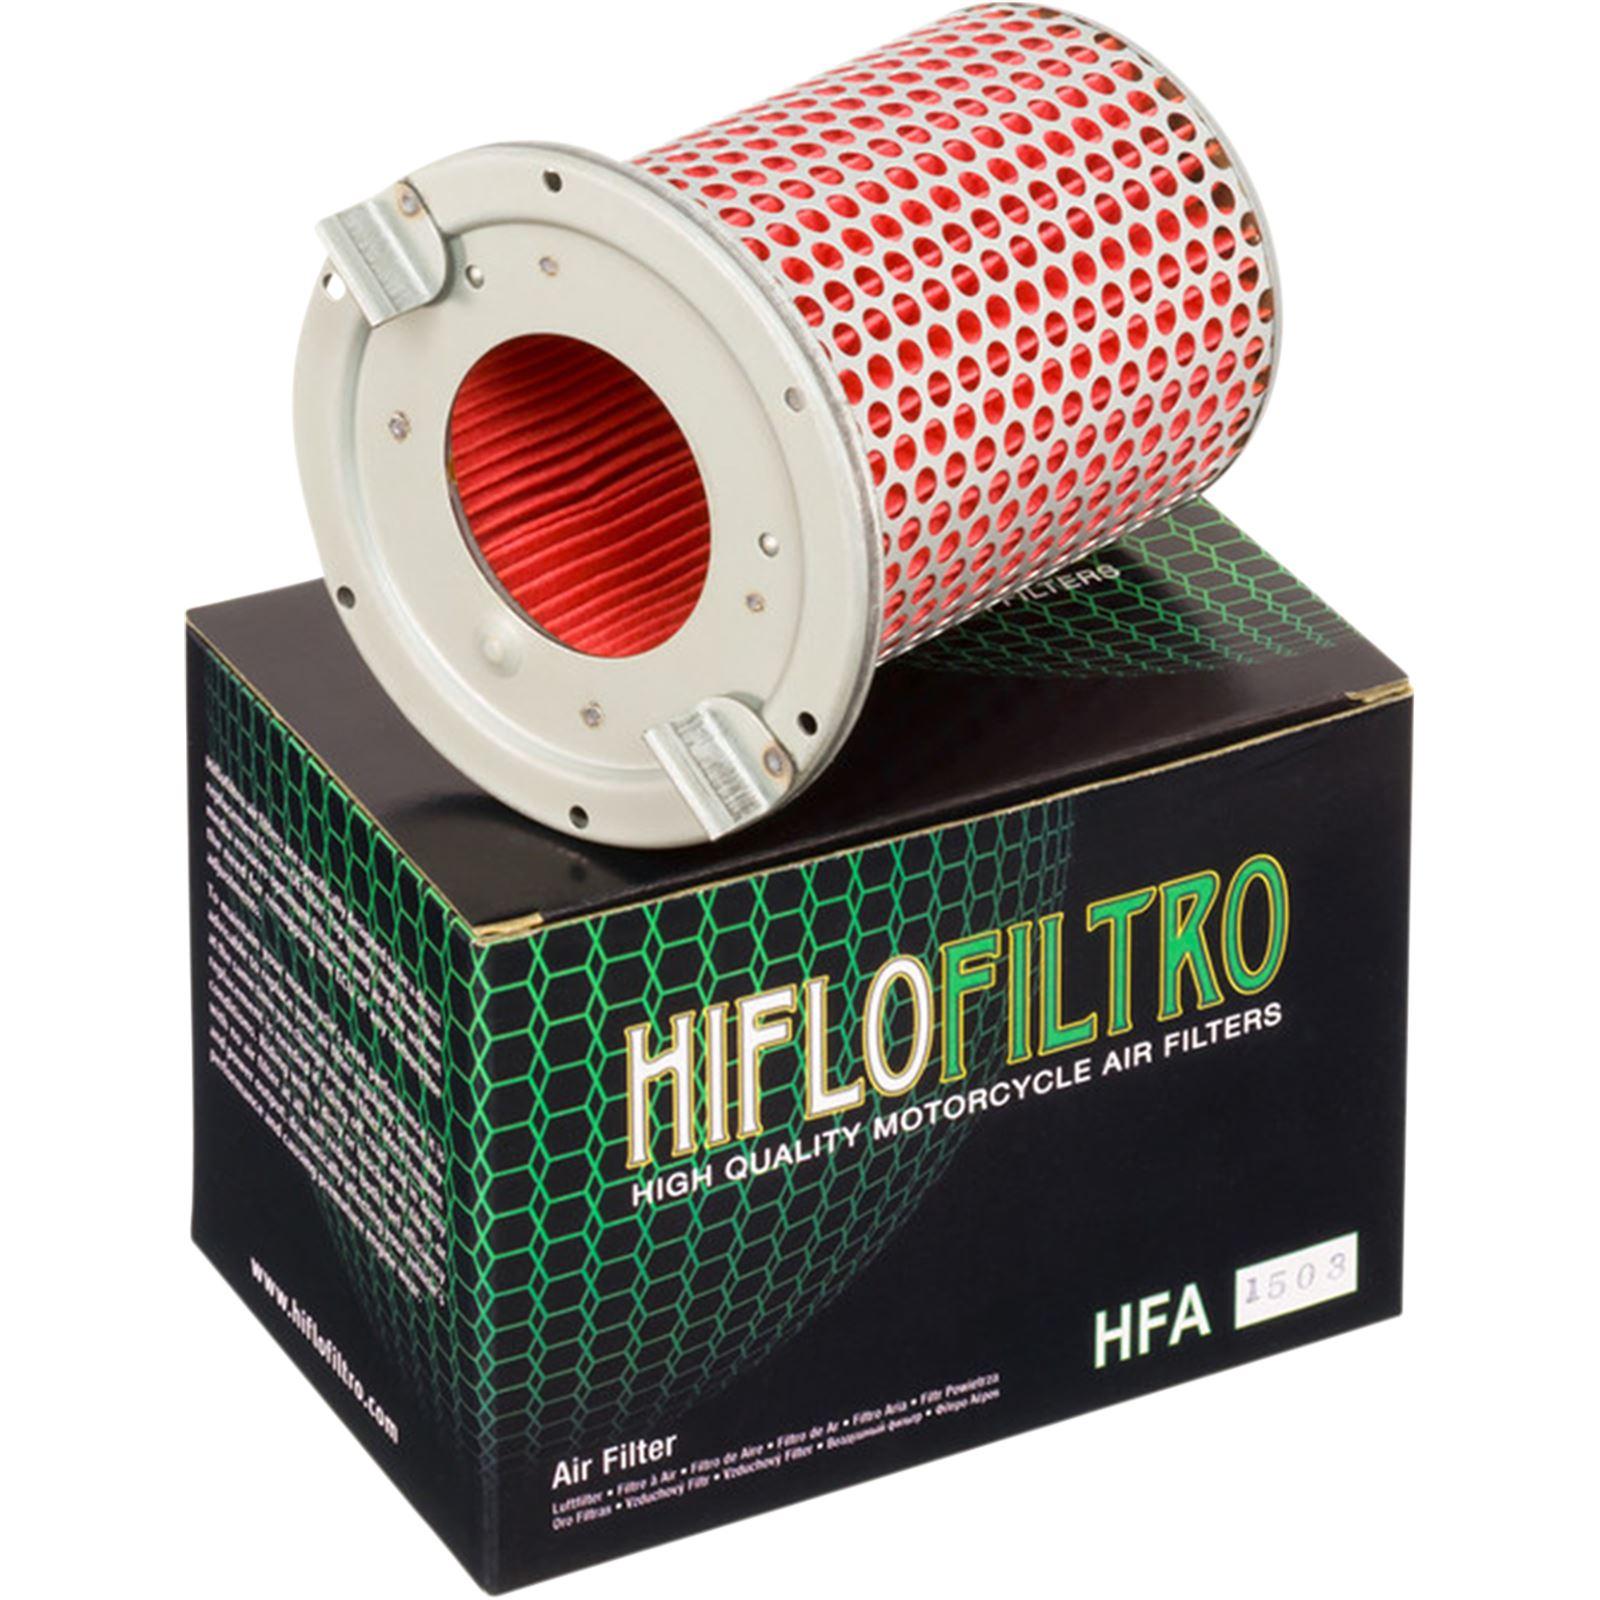 Hiflofiltro Air Filter